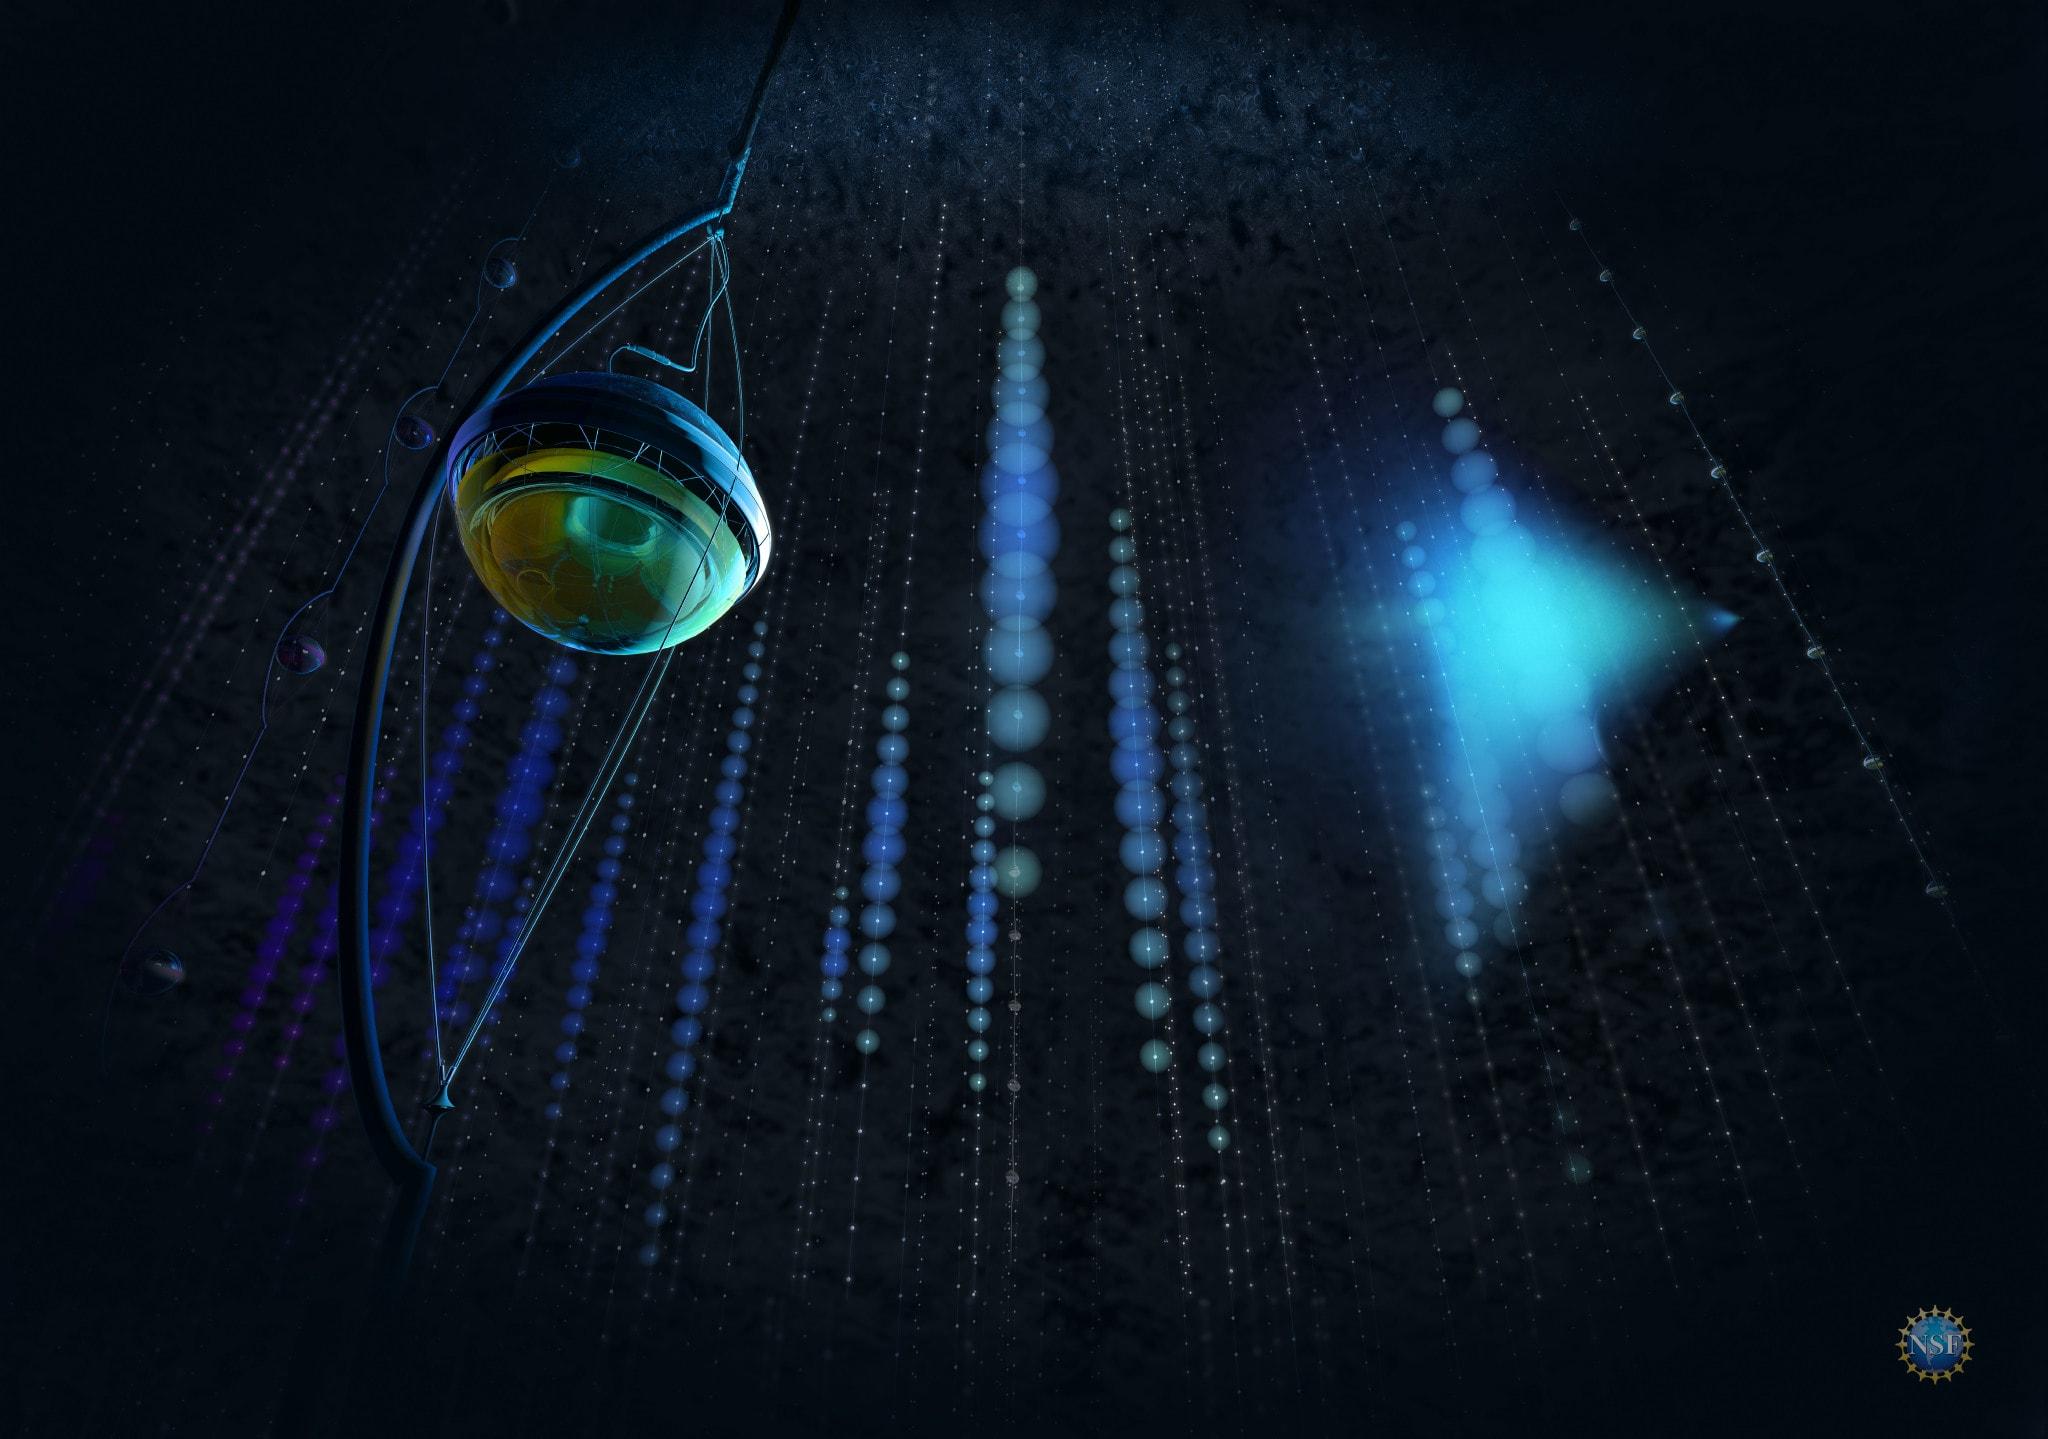 A neutrino detected in IceCube